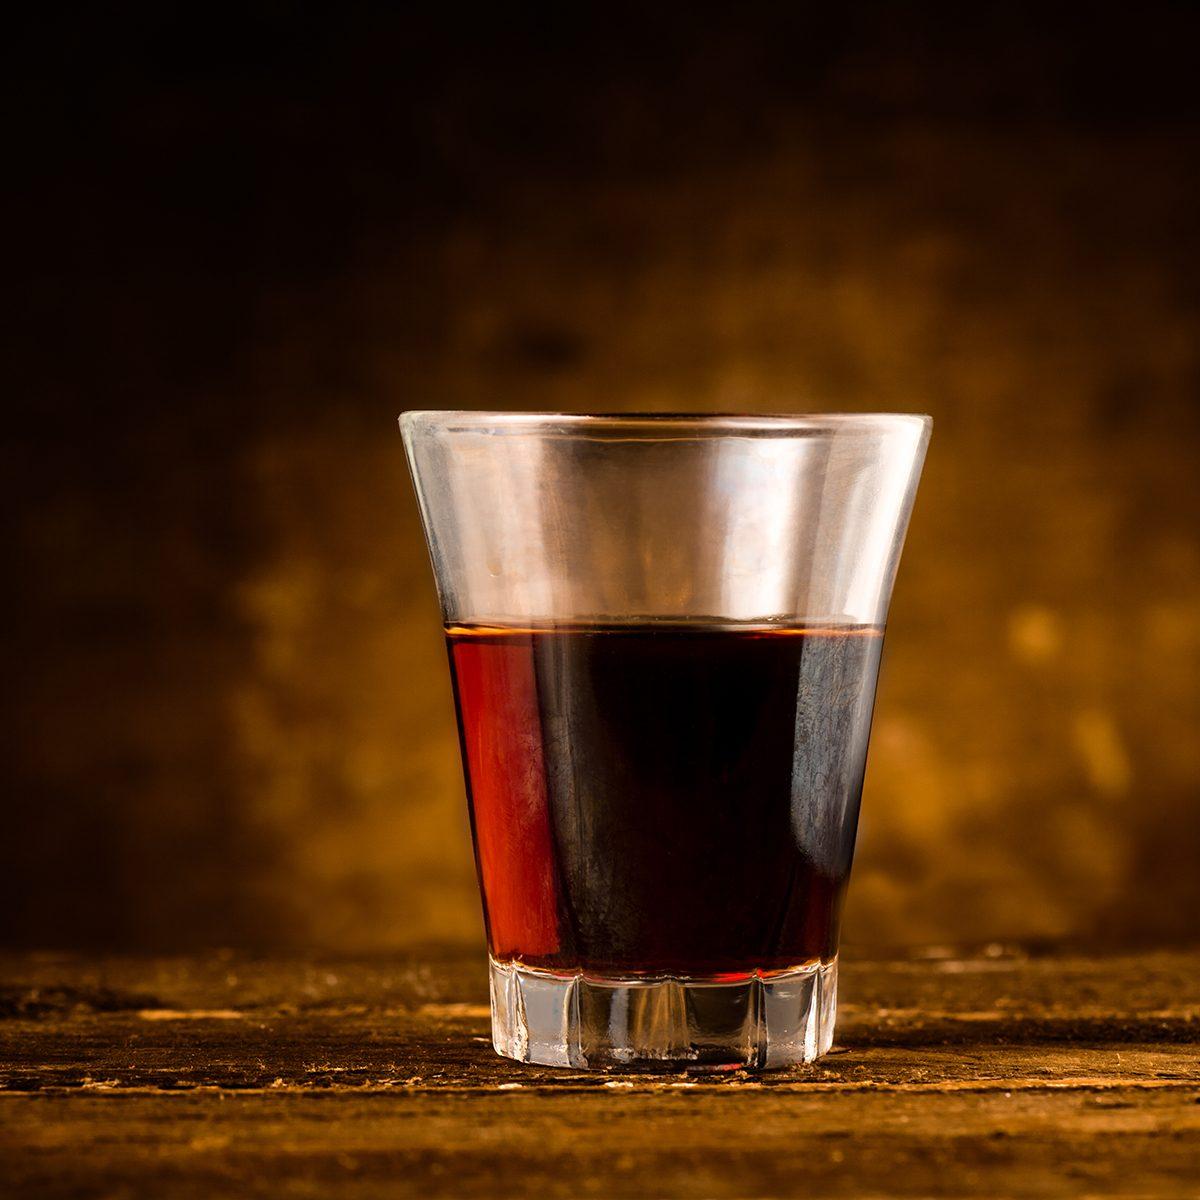 Shot of Alcoholic Bitter Liquor on Wooden Surface